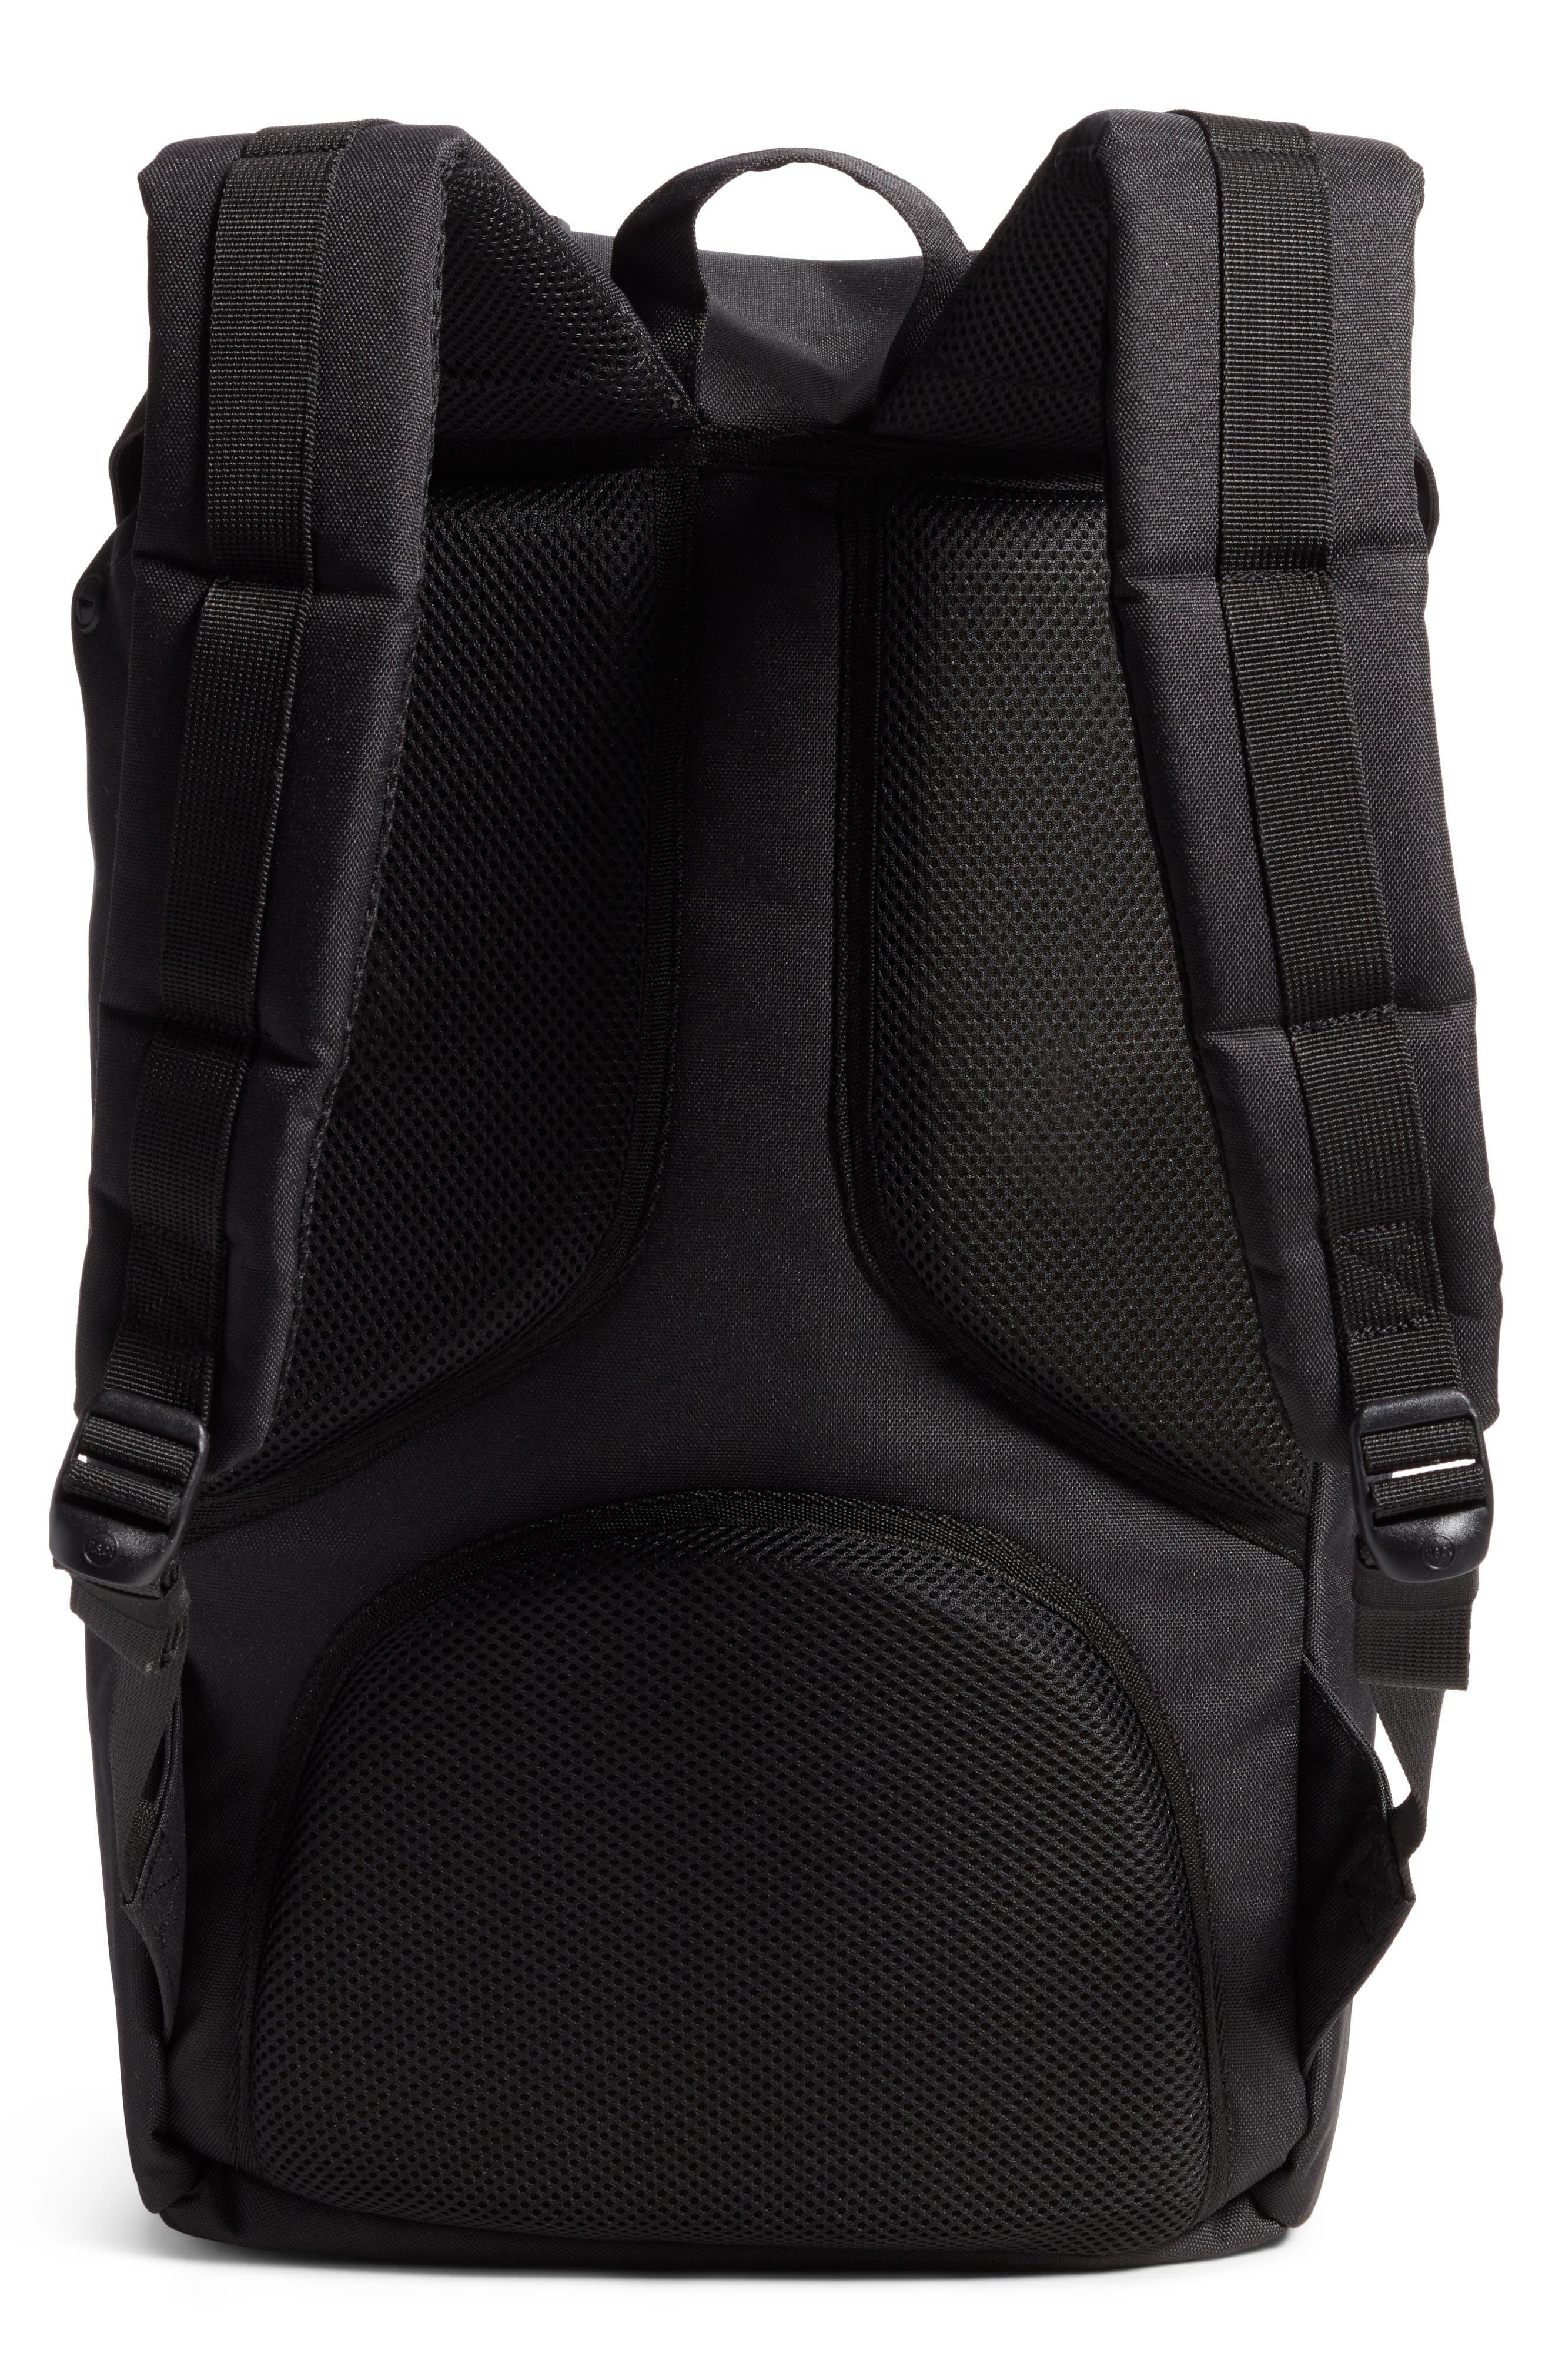 Little America - Chambray Backpack,                             Alternate thumbnail 3, color,                             Black/ Dark Chambray